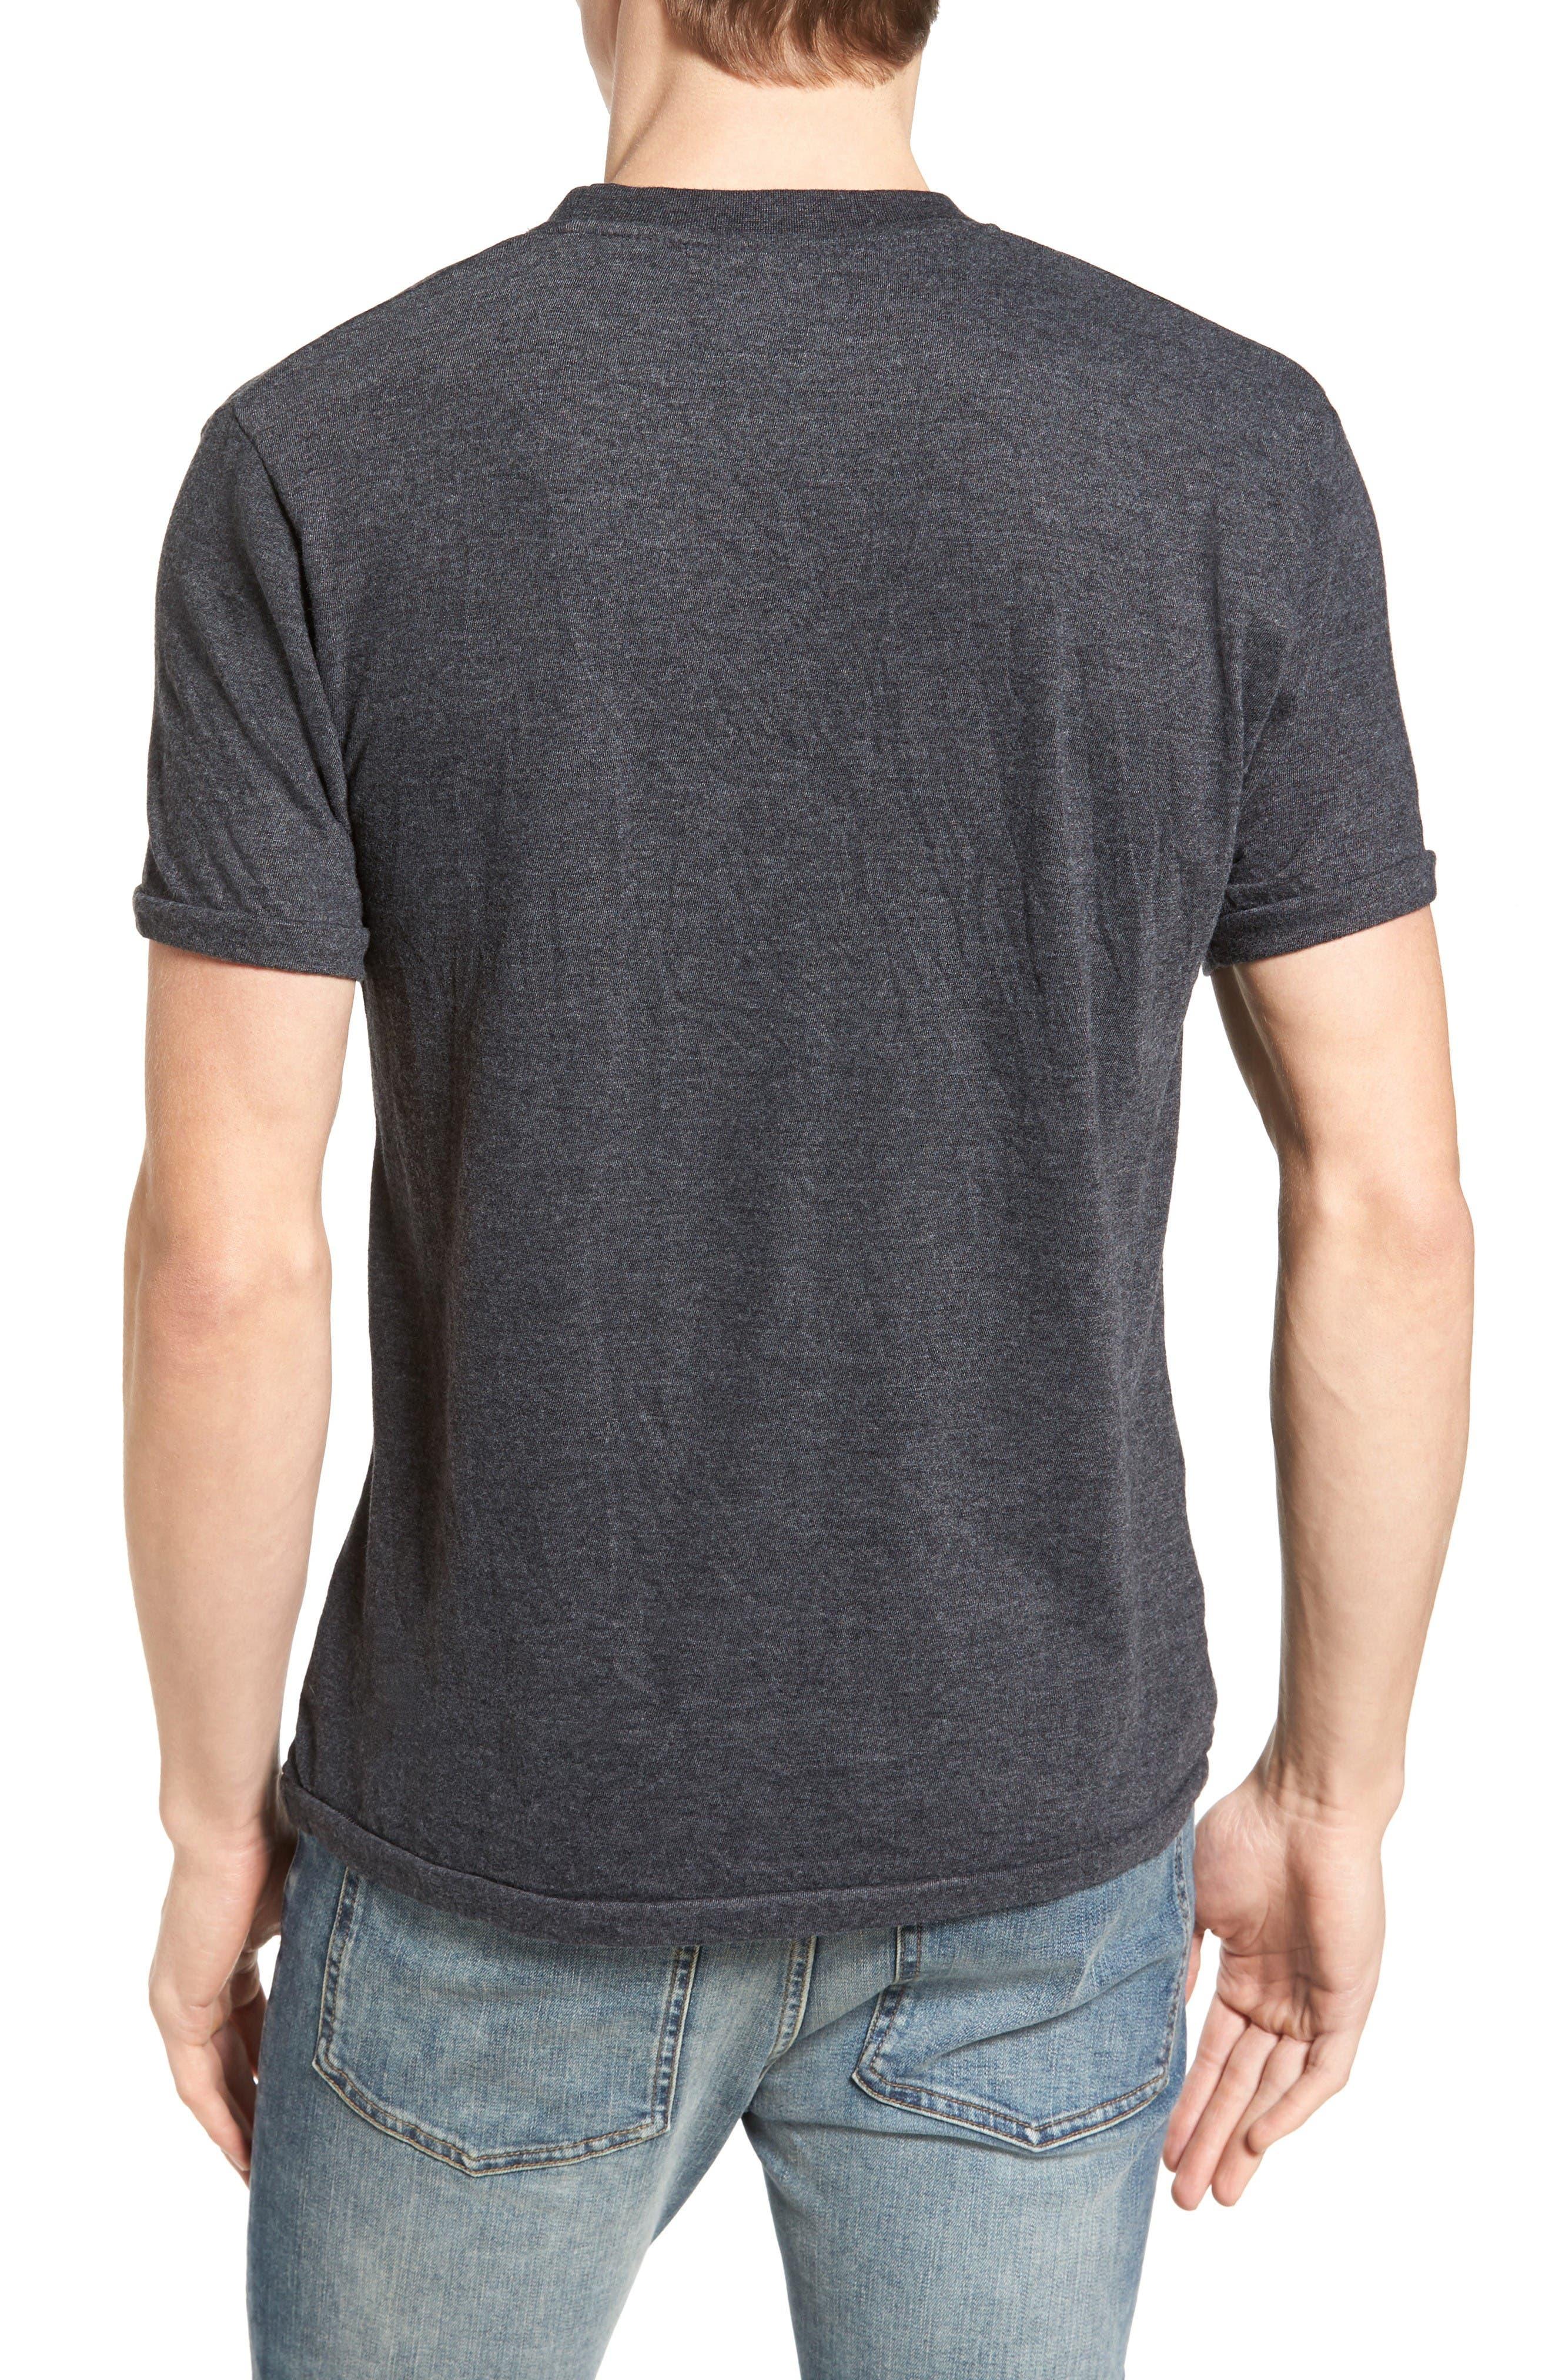 Alternate Image 2  - American Needle Hillwood Cincinnati Reds T-Shirt